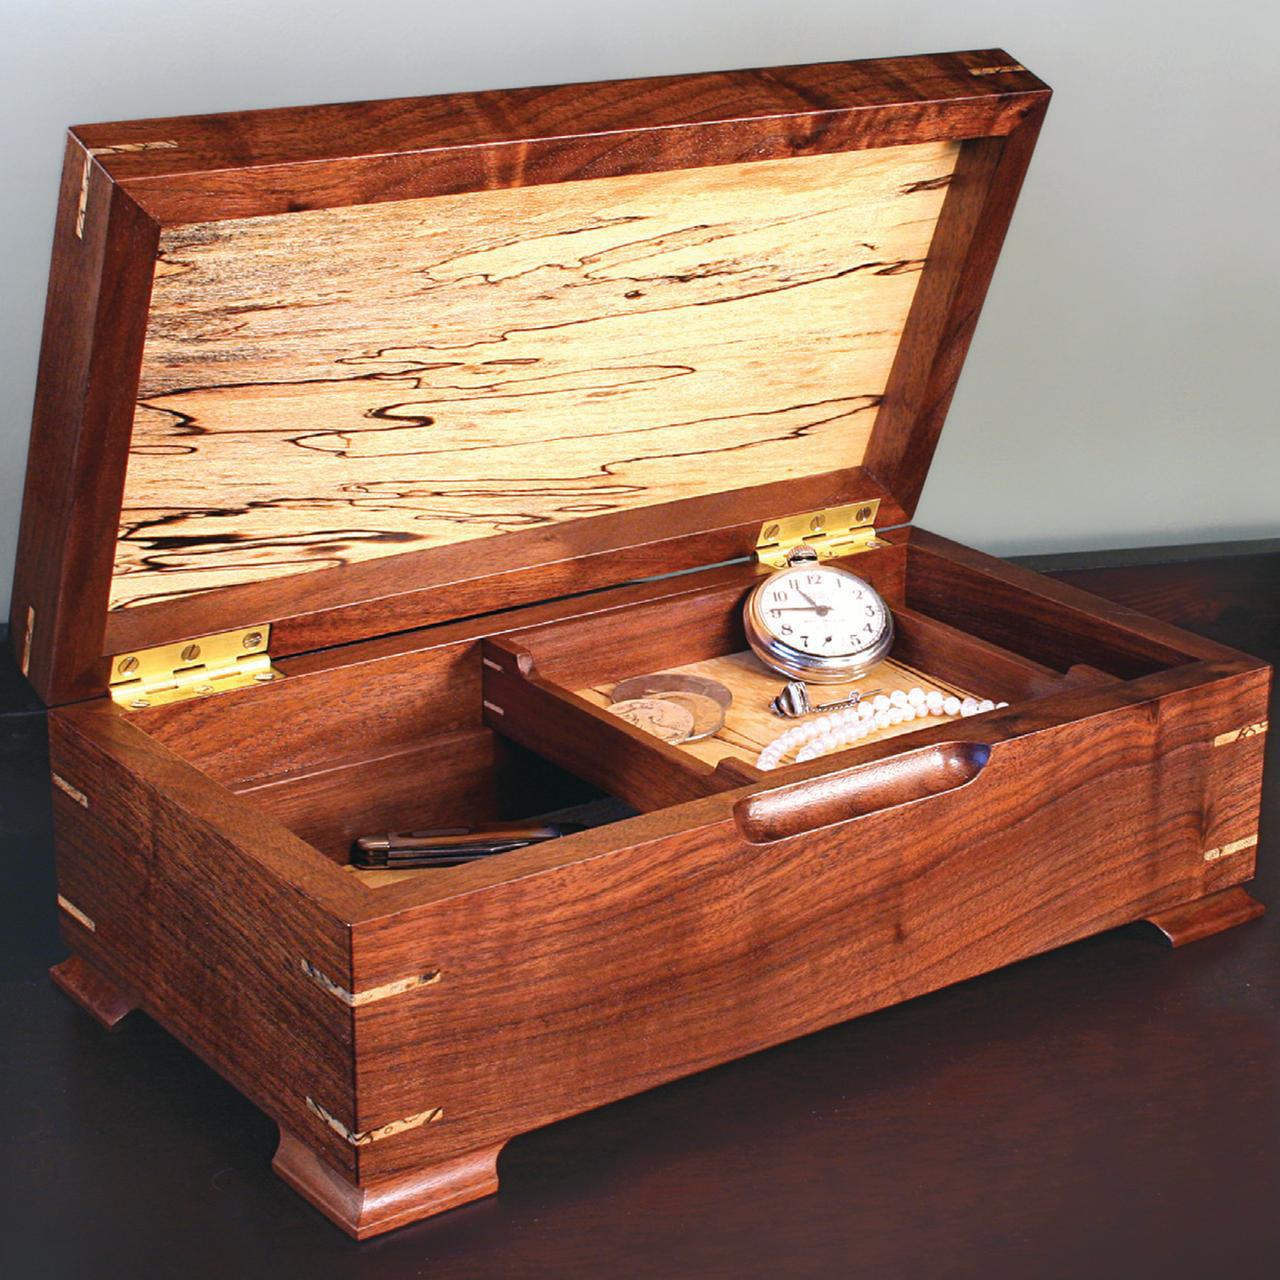 Woodworking Project Paper Plan To Build Keepsake Jewelry Box Plan Only Walmart Com Walmart Com